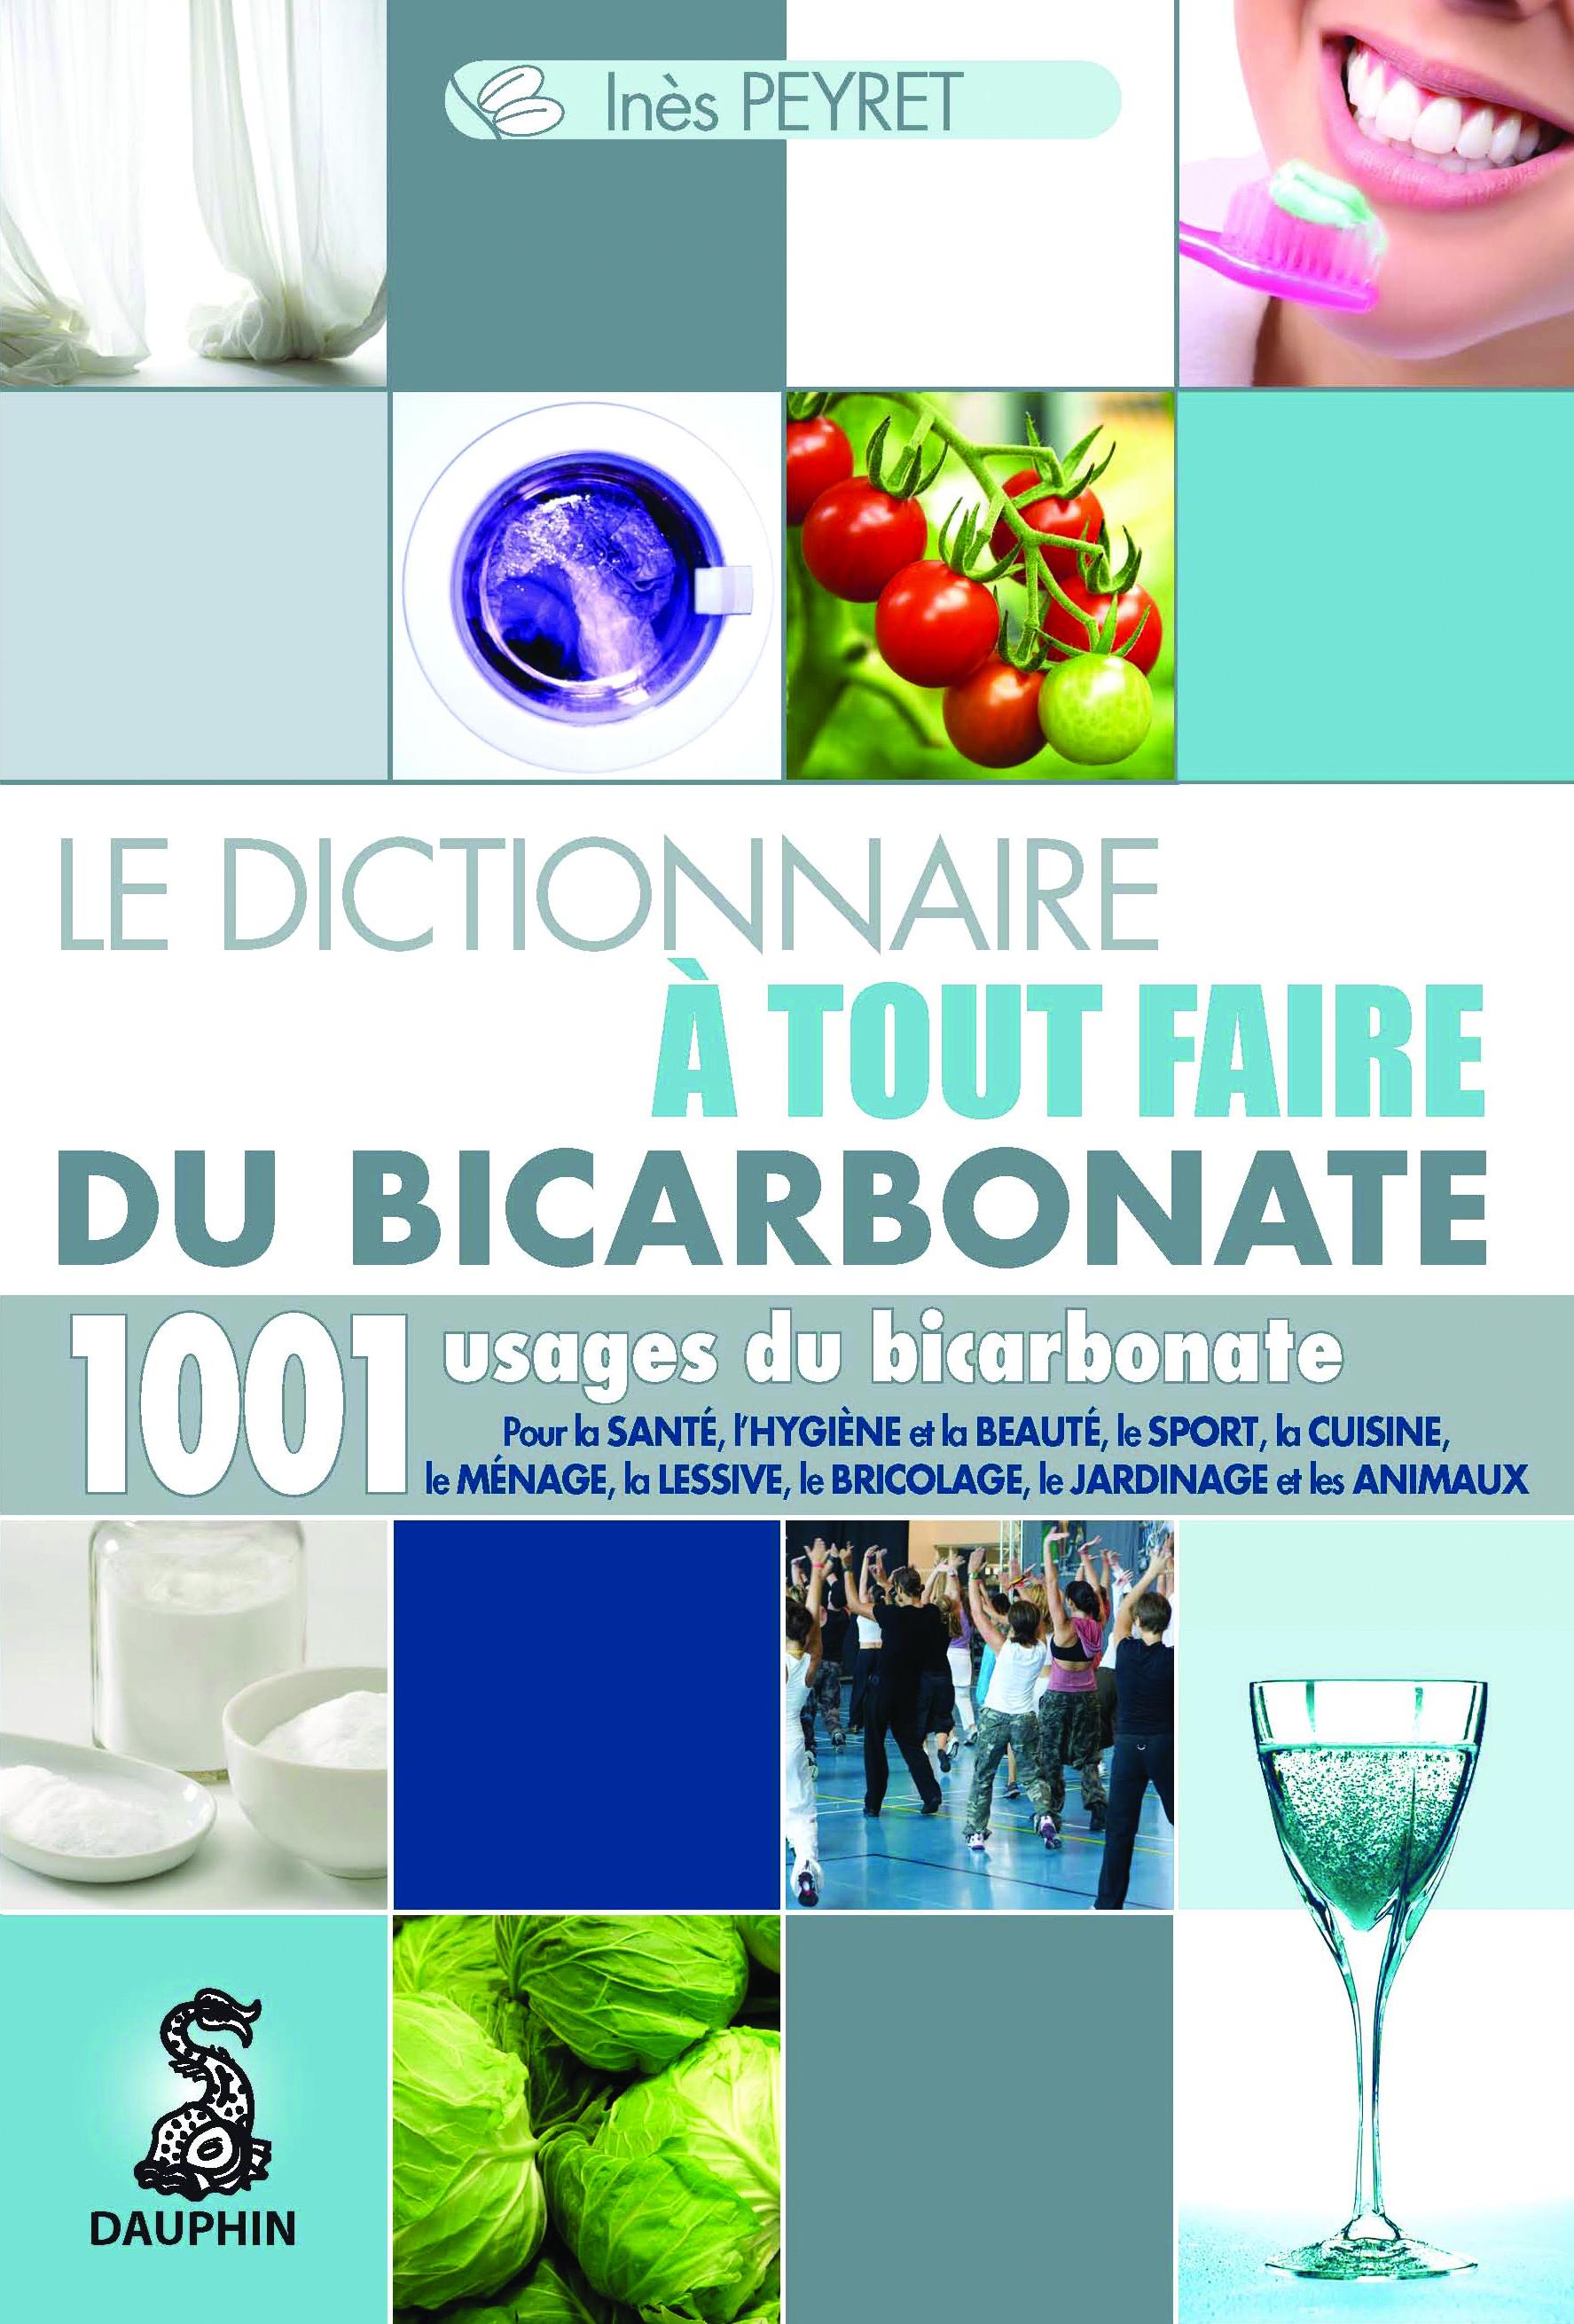 Bicarbonate_Sante_Hygiene_Beaute_Sport_Cuisine_Menage_Lessive_Jardinage_Bricolage_Animaux